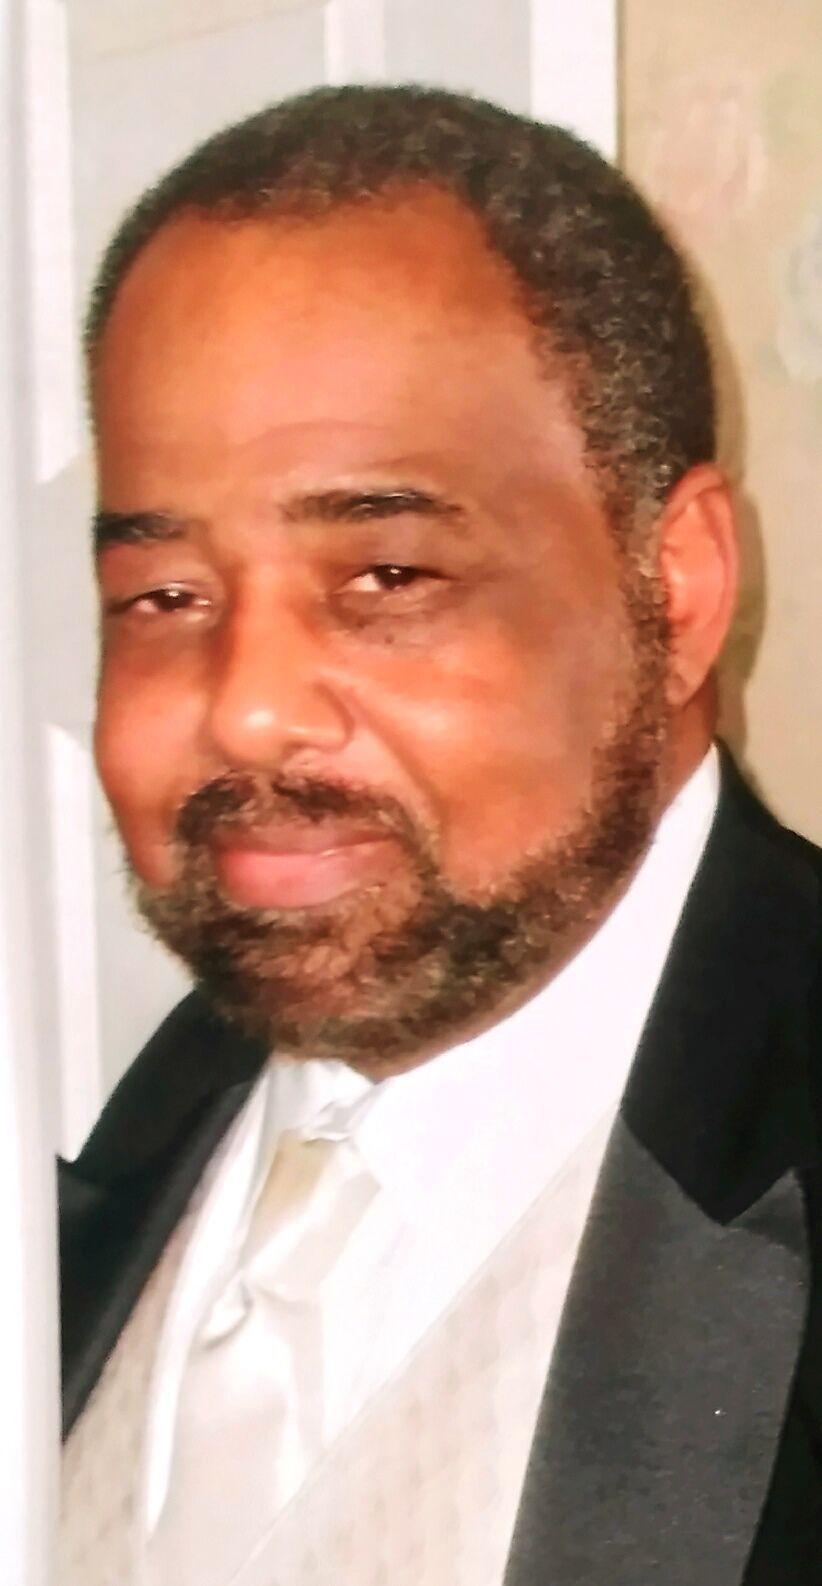 Melvin Devon White